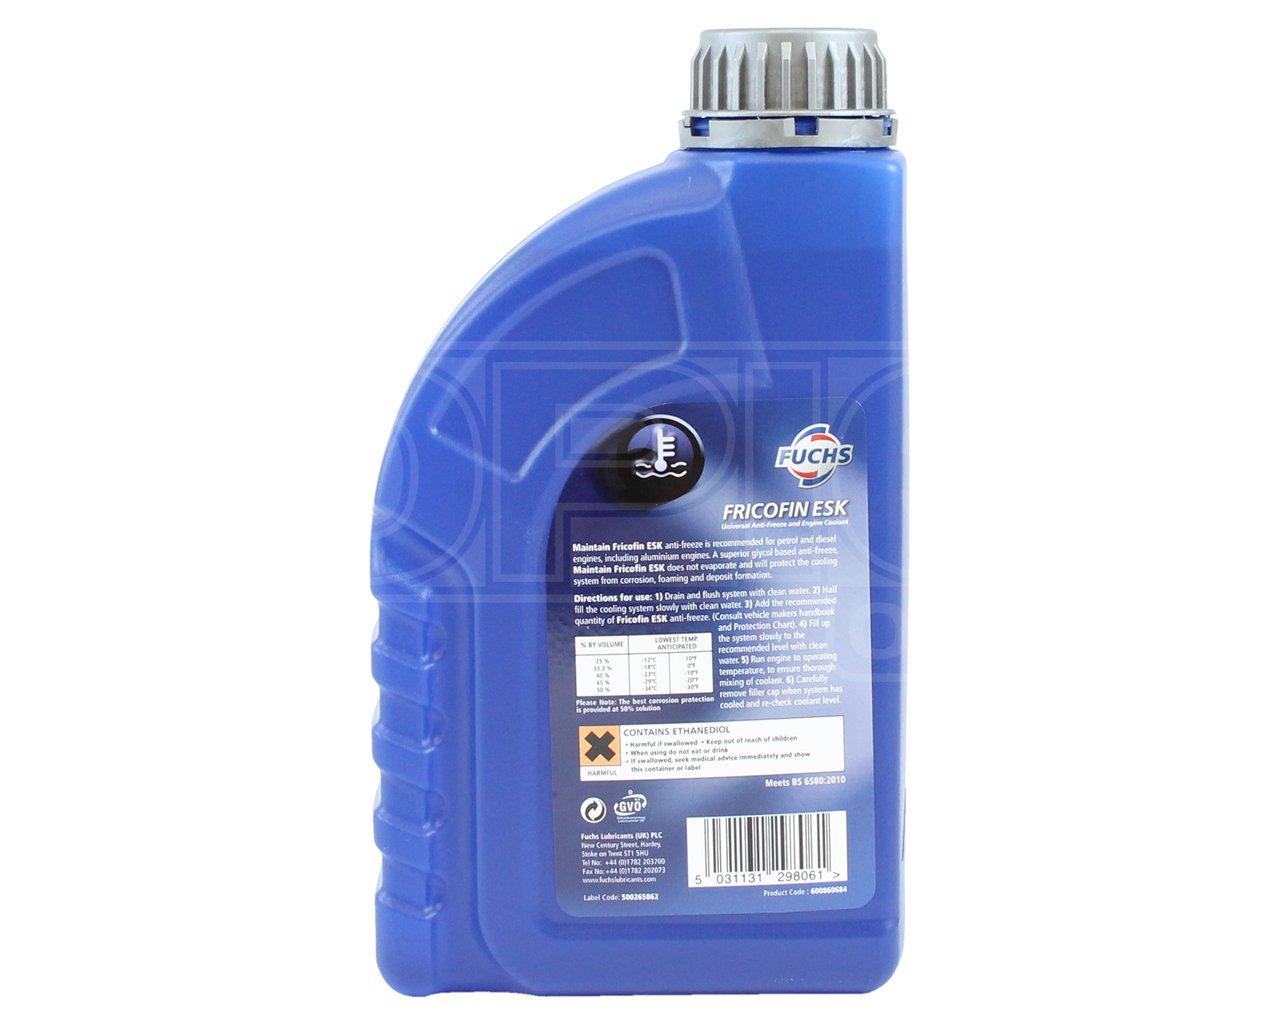 Fuchs mantener fricofin Esk Universal anticongelante/líquido ...